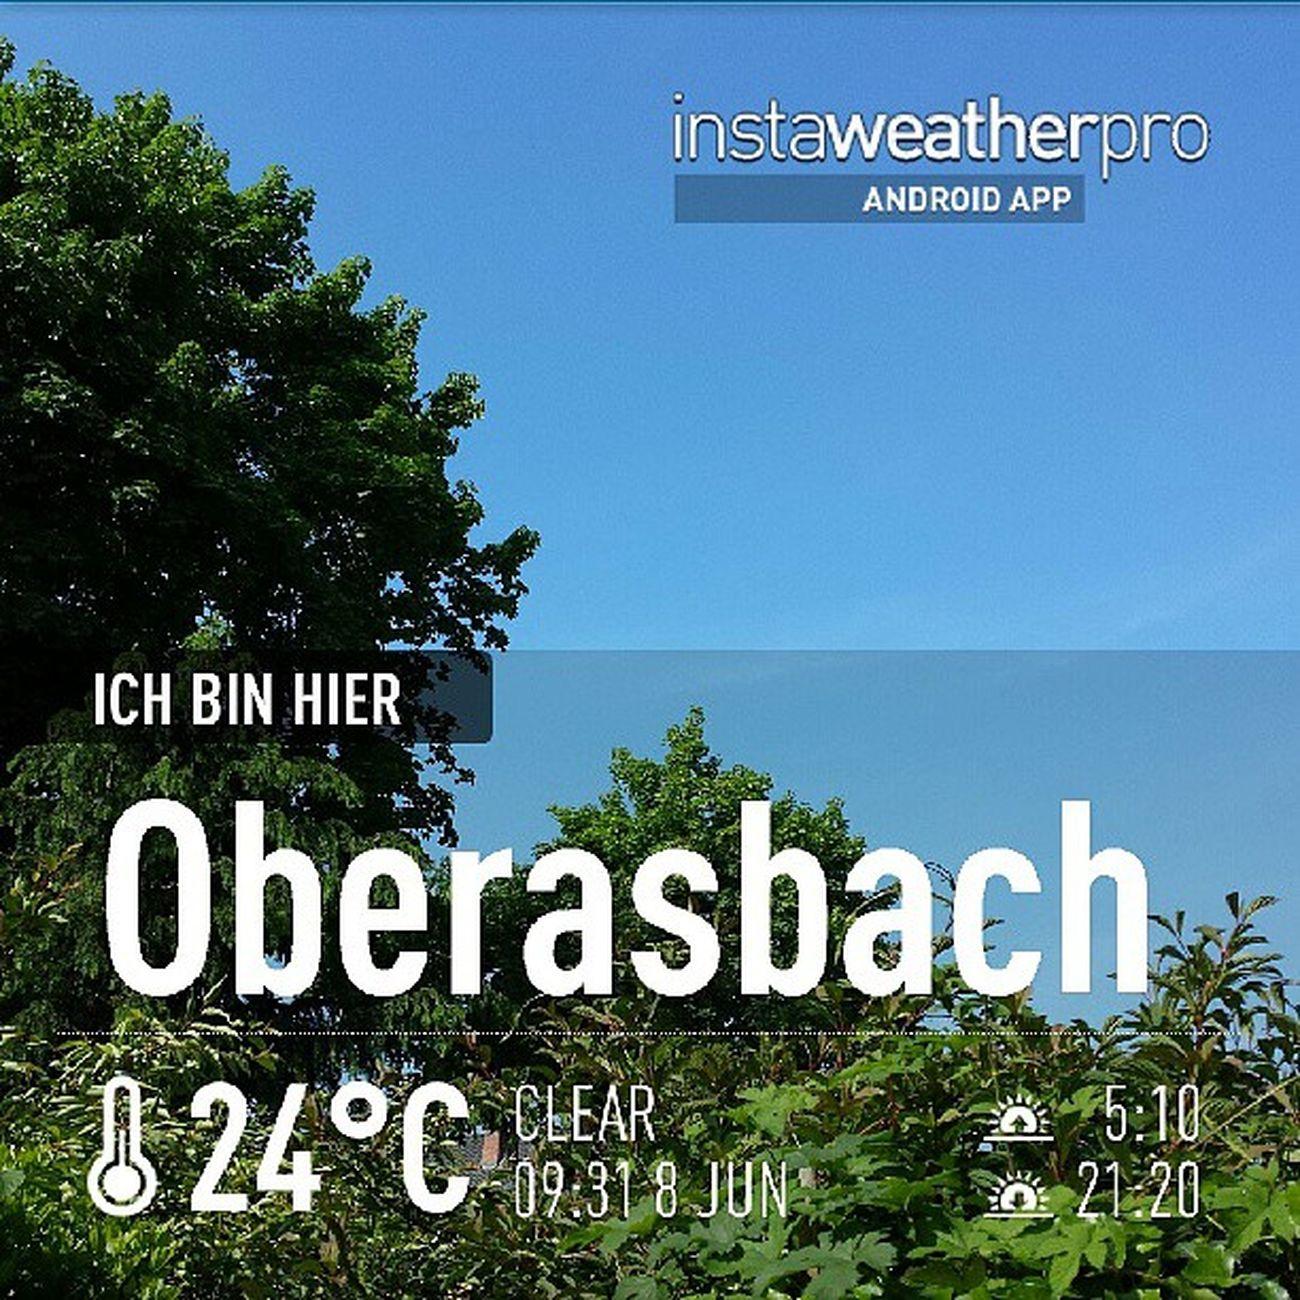 Weather Instaweather Instaweatherpro Androidonly androidnesia instagood Oberasbach Deutschland